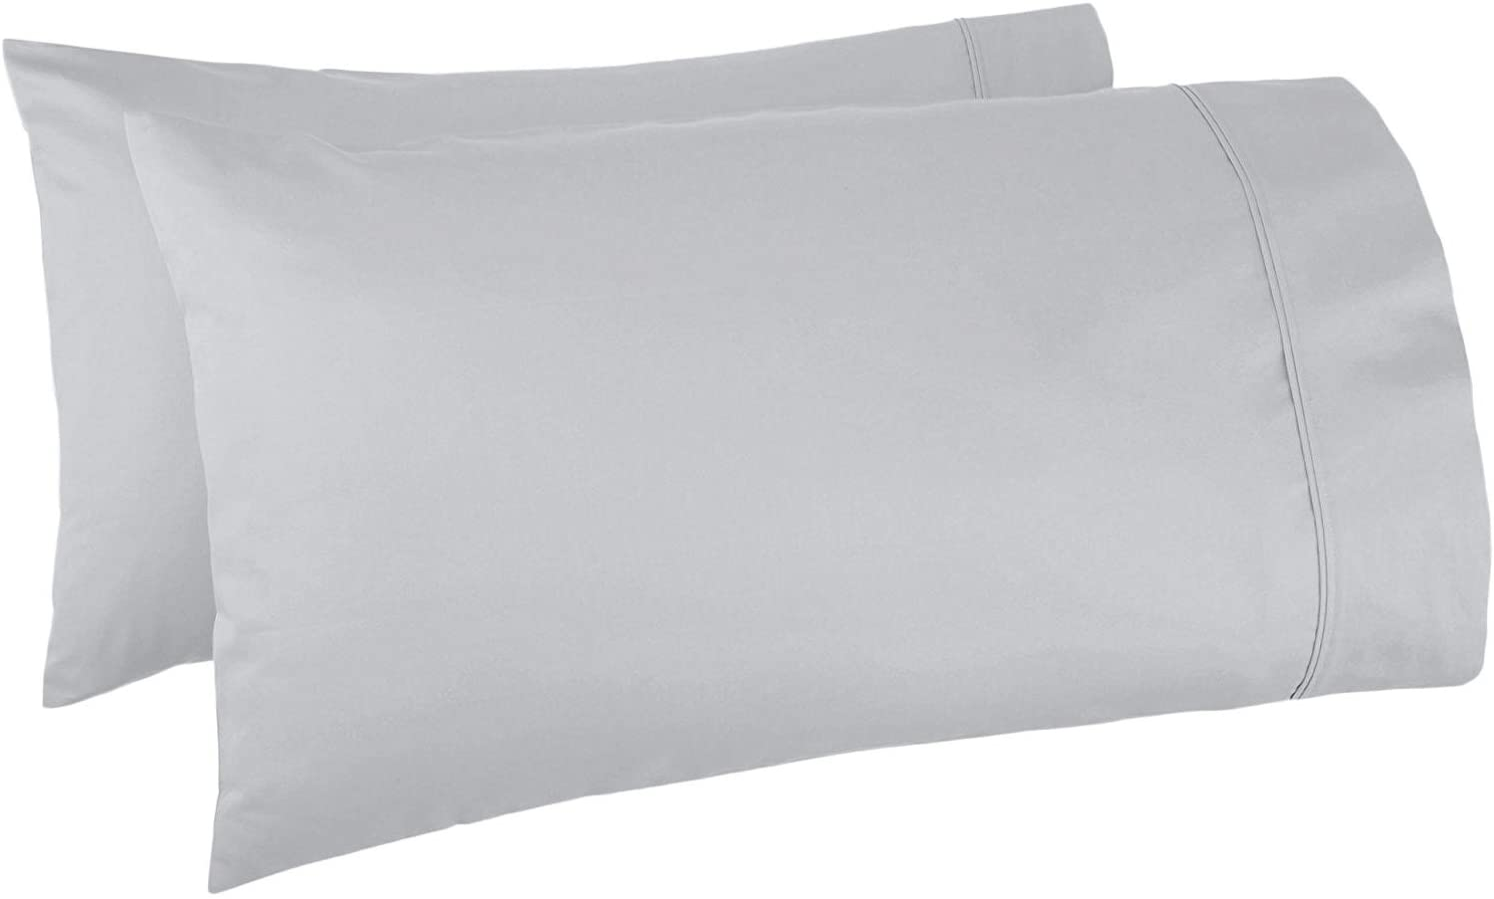 Mayfair Linen Pillow Case Set 500 Thread Count 100% Egyptian Cotton 2pc, Silky Soft & Durable - Standard/Queen Size - Silver